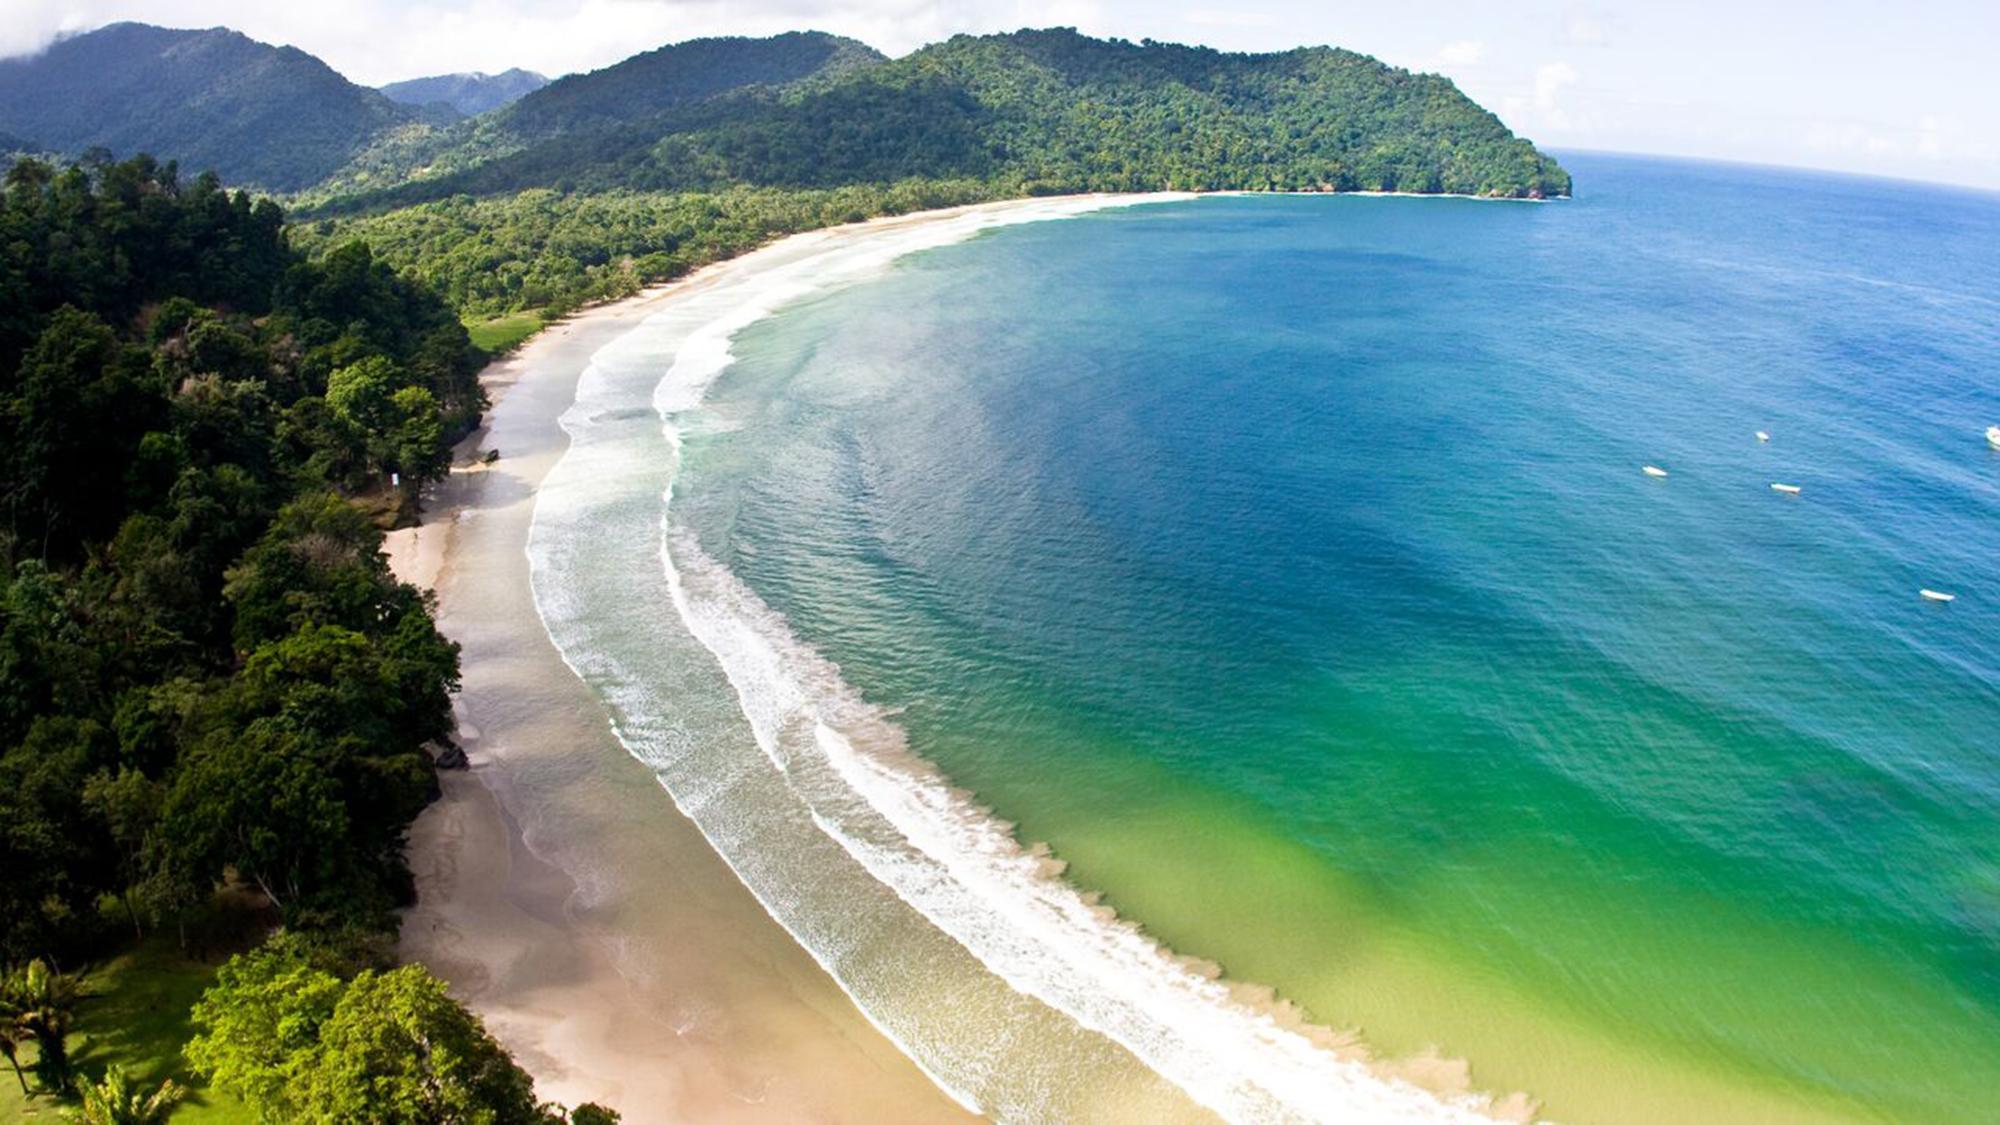 Cuba The Caribbean Luxury Yacht Charter Destination Of 2018 Yacht Charter Amp Superyacht News